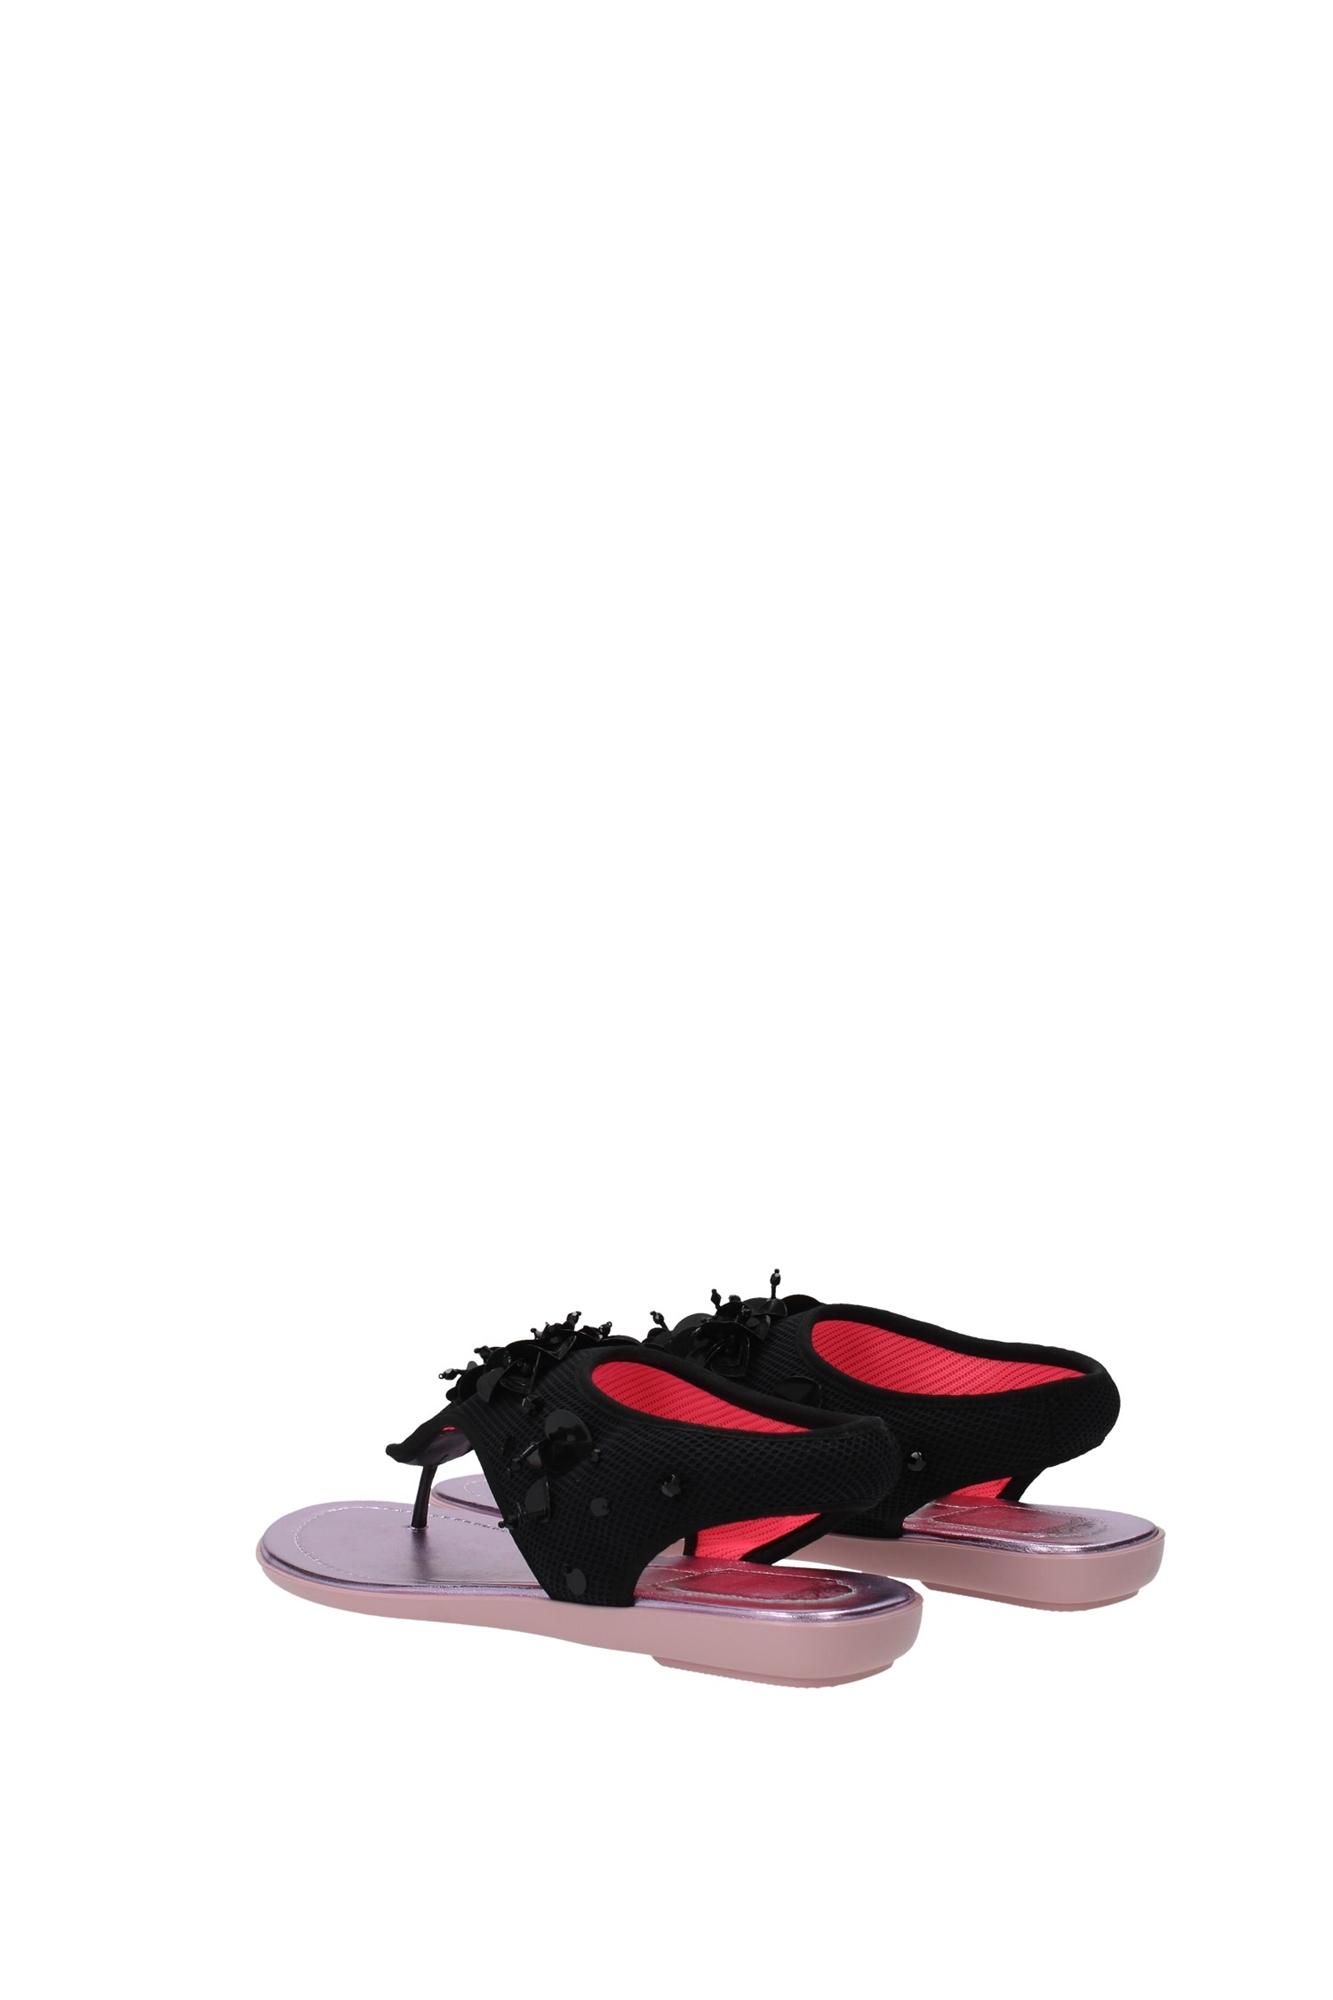 flip flops christian dior damen stoff schwarz kcg111bms ebay